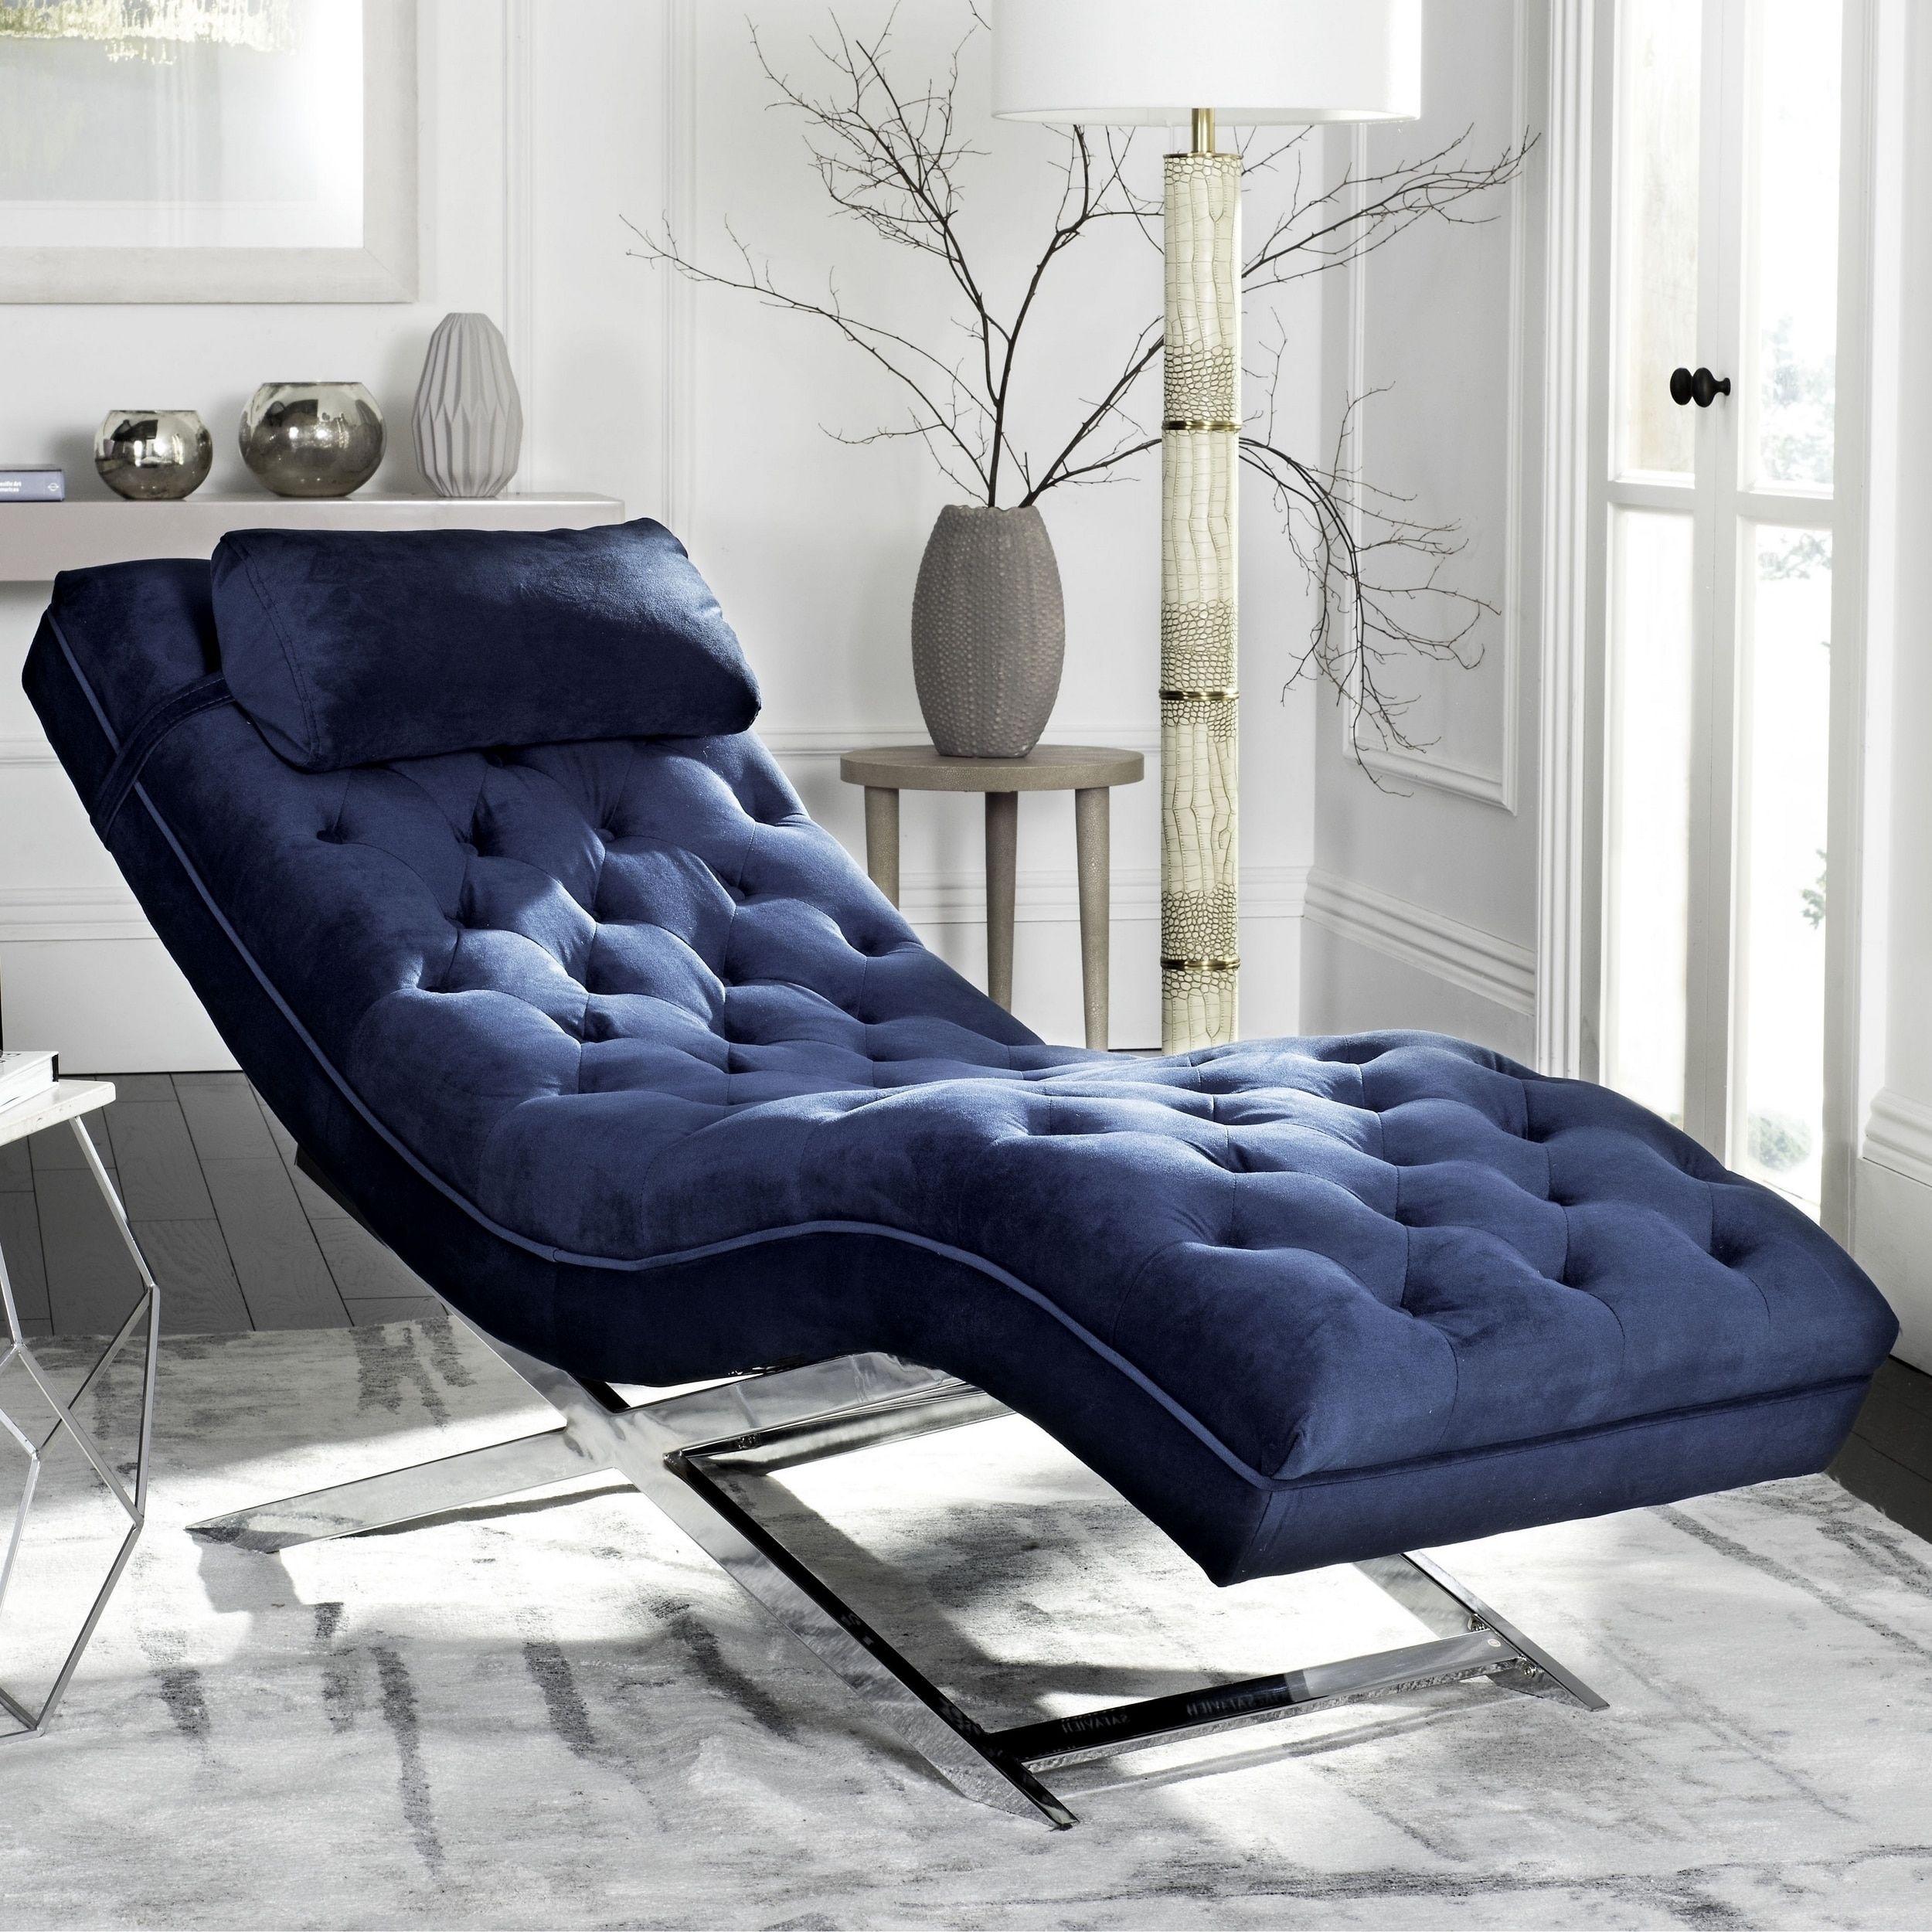 Safavieh Monroe Navy Chaise Chaise Lounge Chair Chaise Lounge Comfortable Chaise